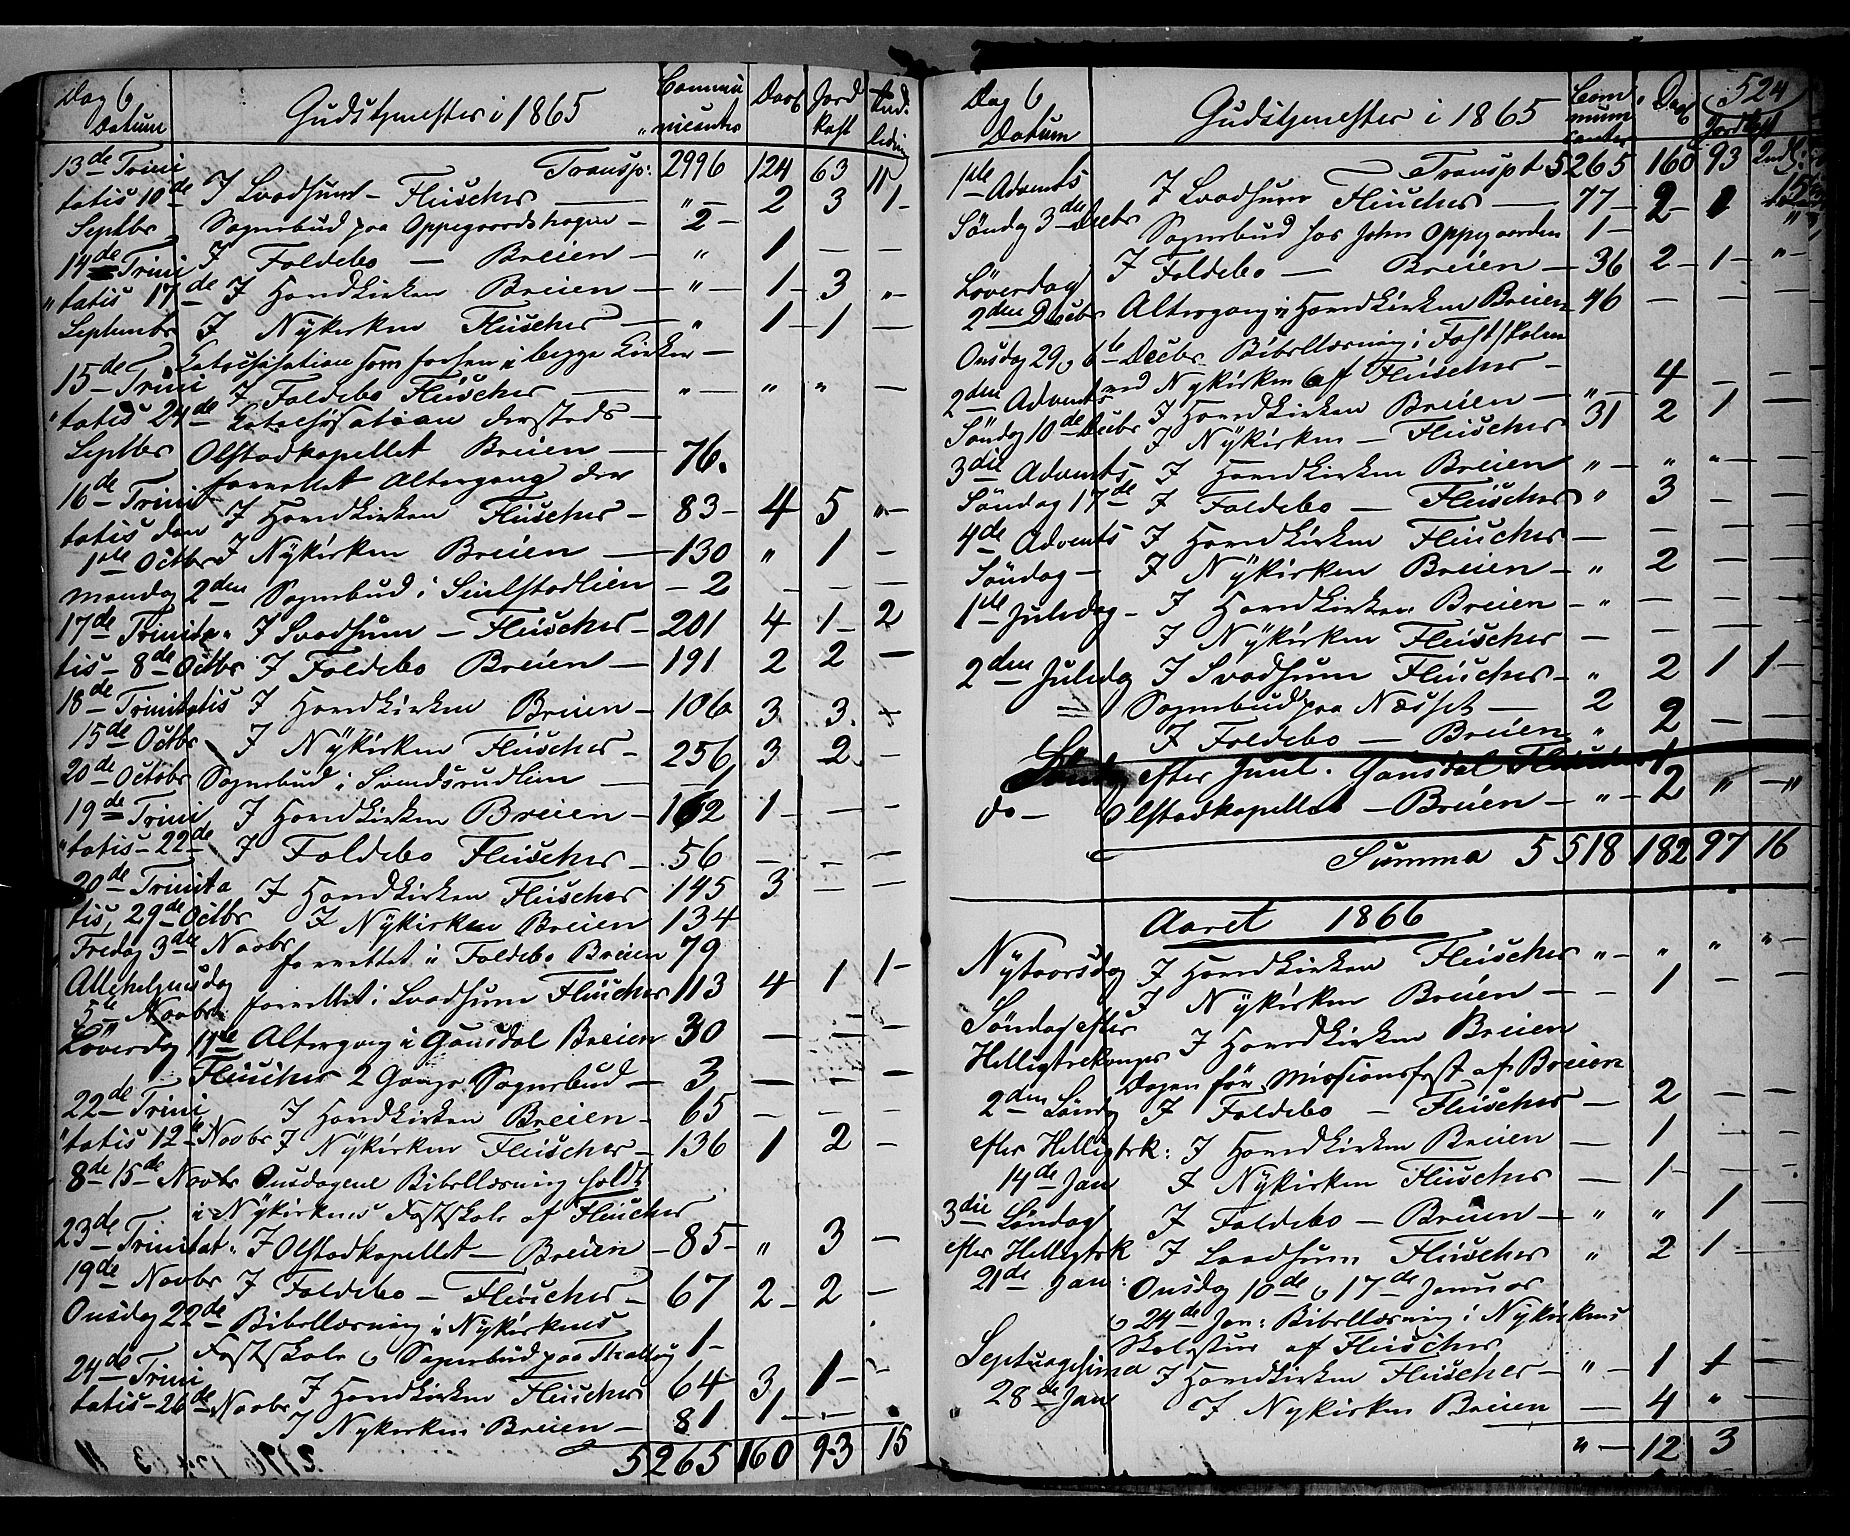 SAH, Gausdal prestekontor, Ministerialbok nr. 9, 1862-1873, s. 524